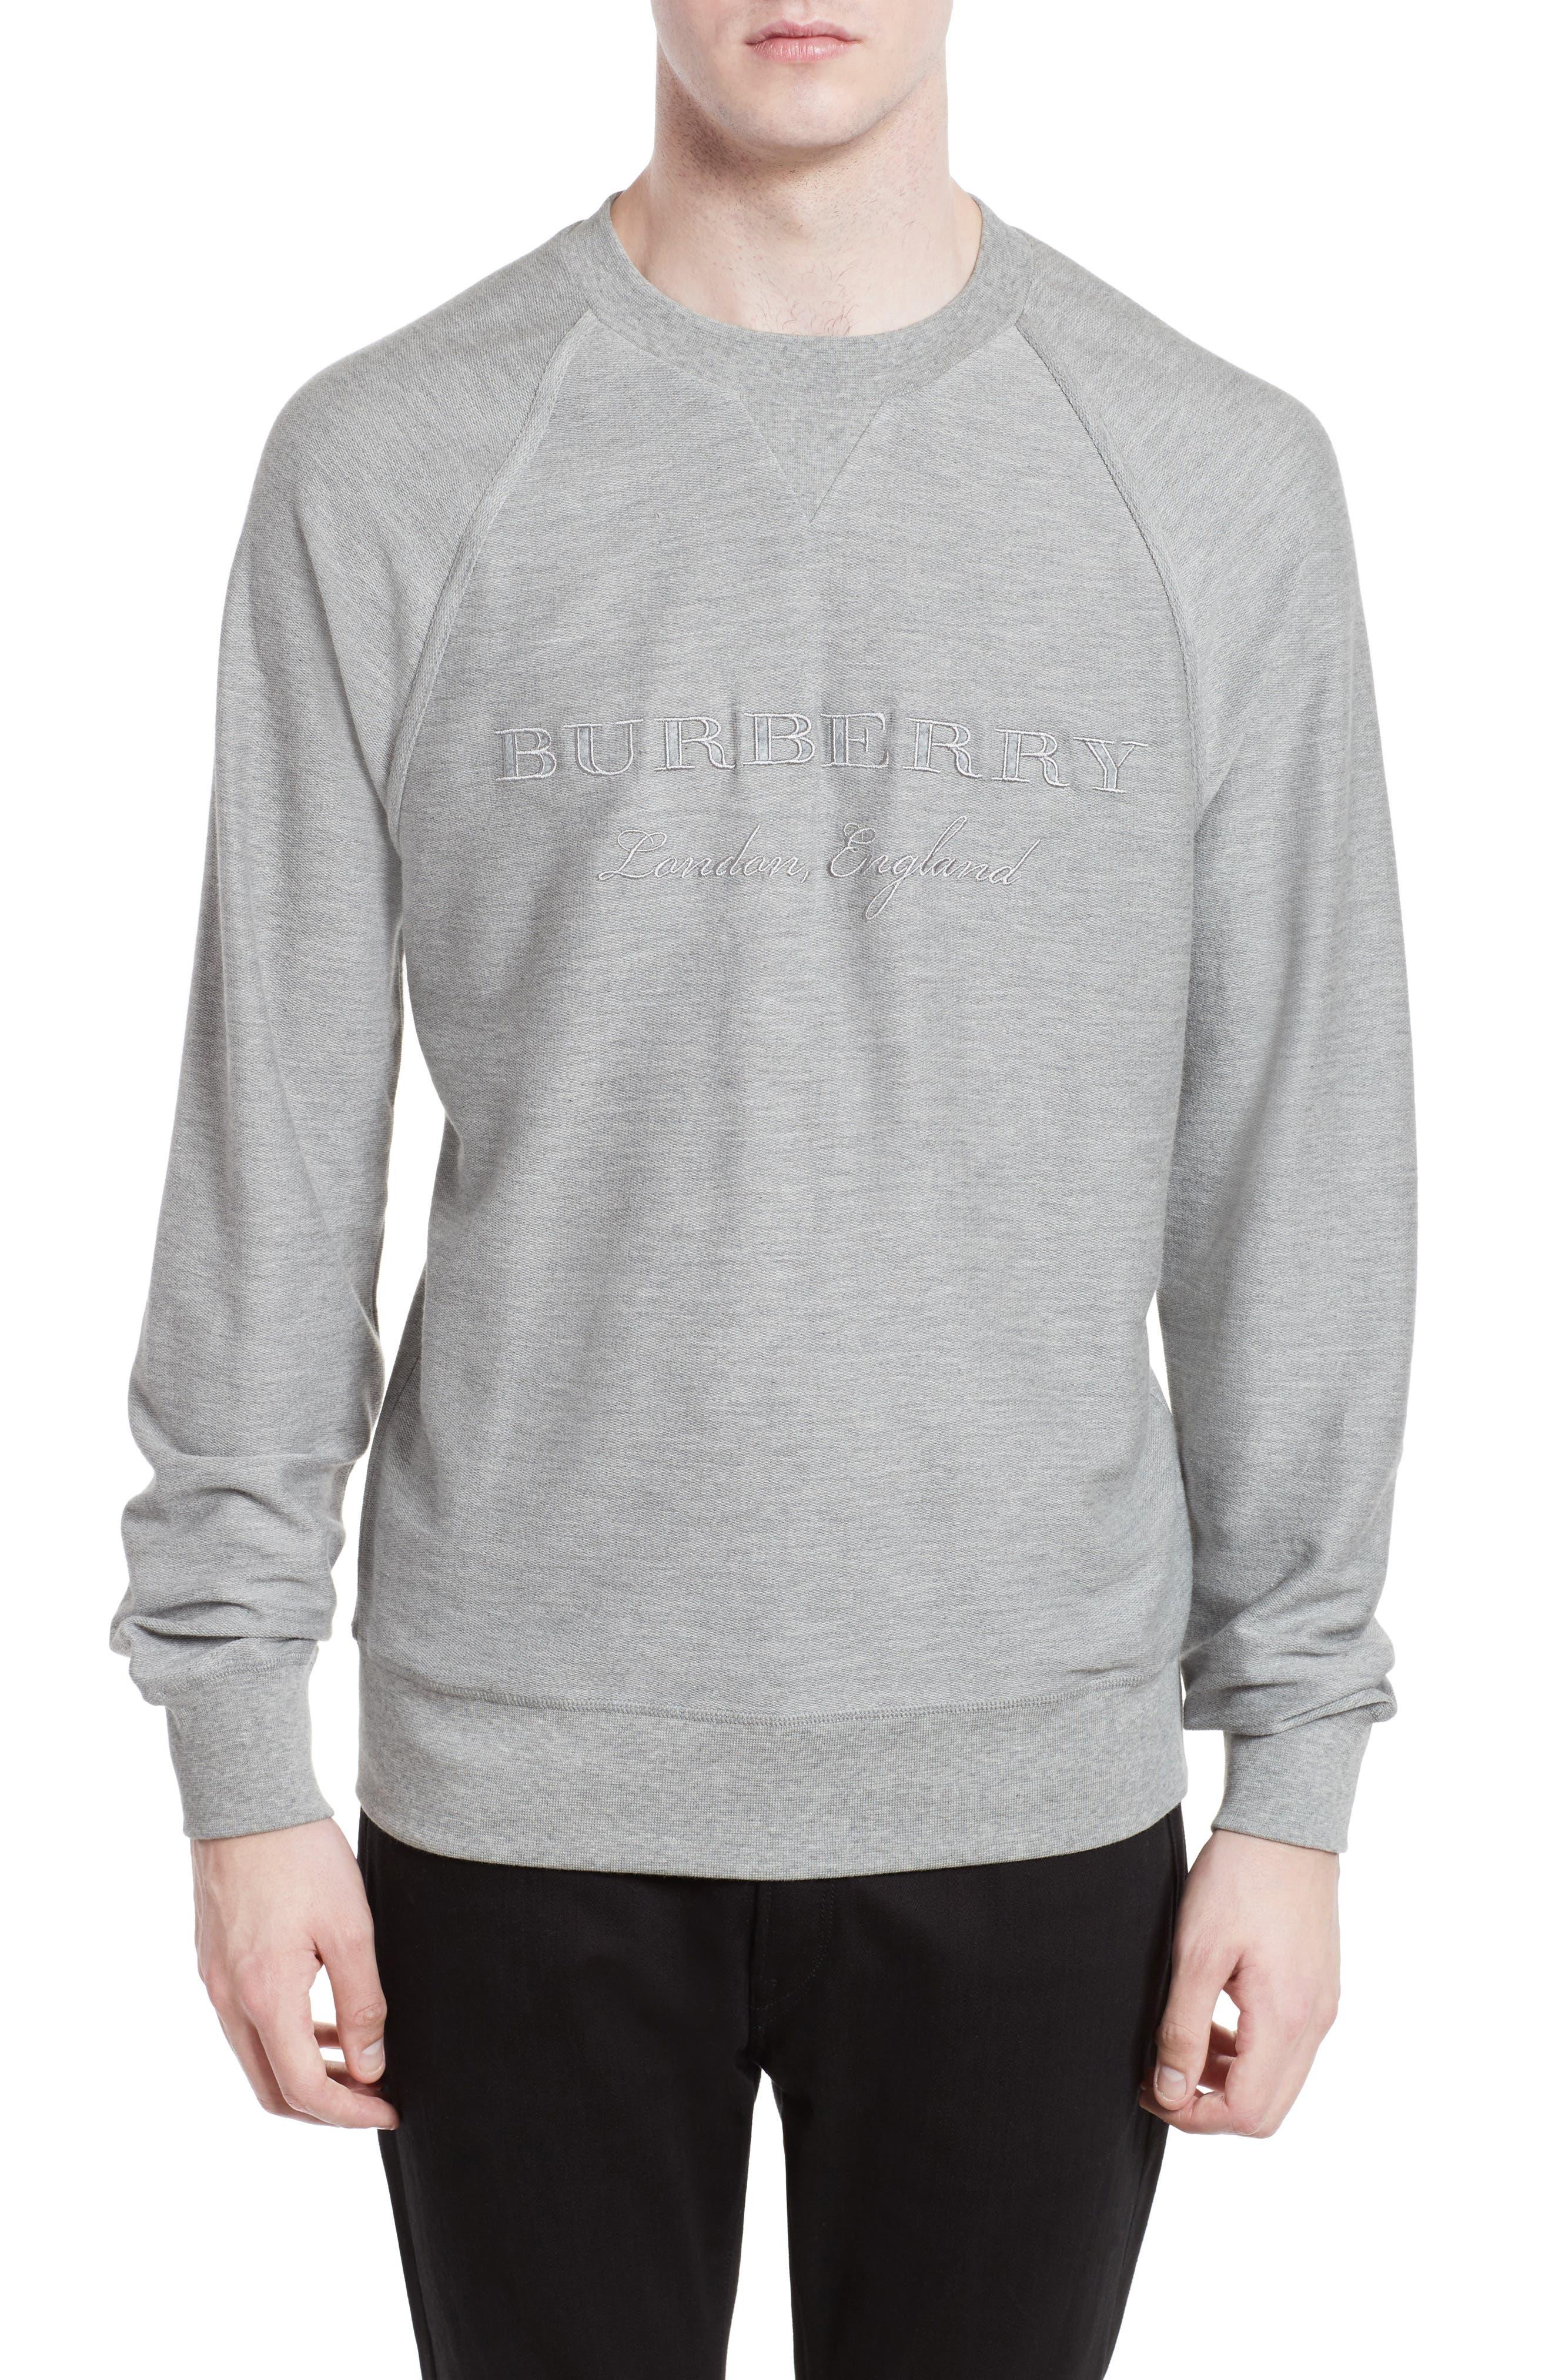 Burberry Coleford Embroidered Logo Sweatshirt